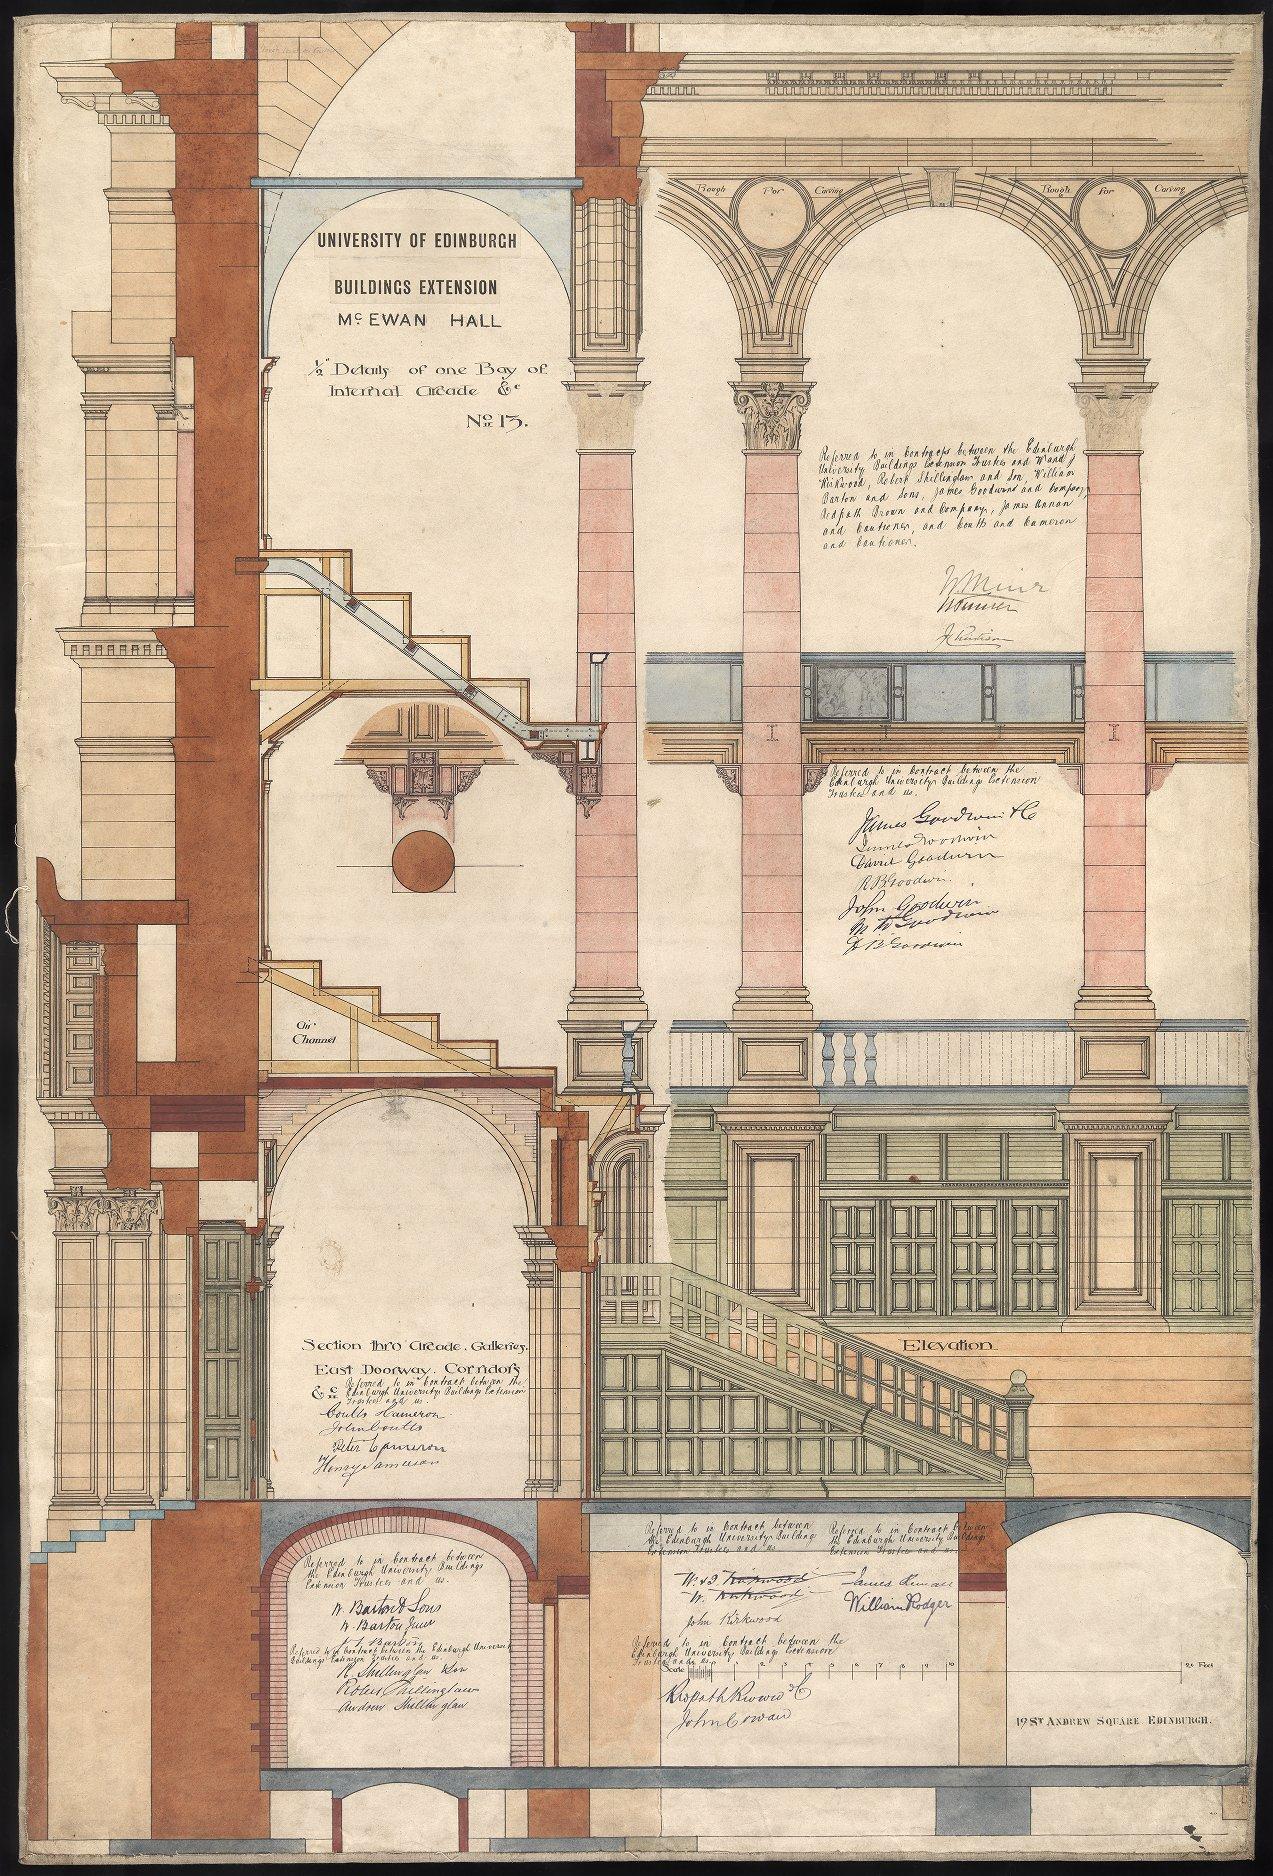 Plans for McEwan Hall